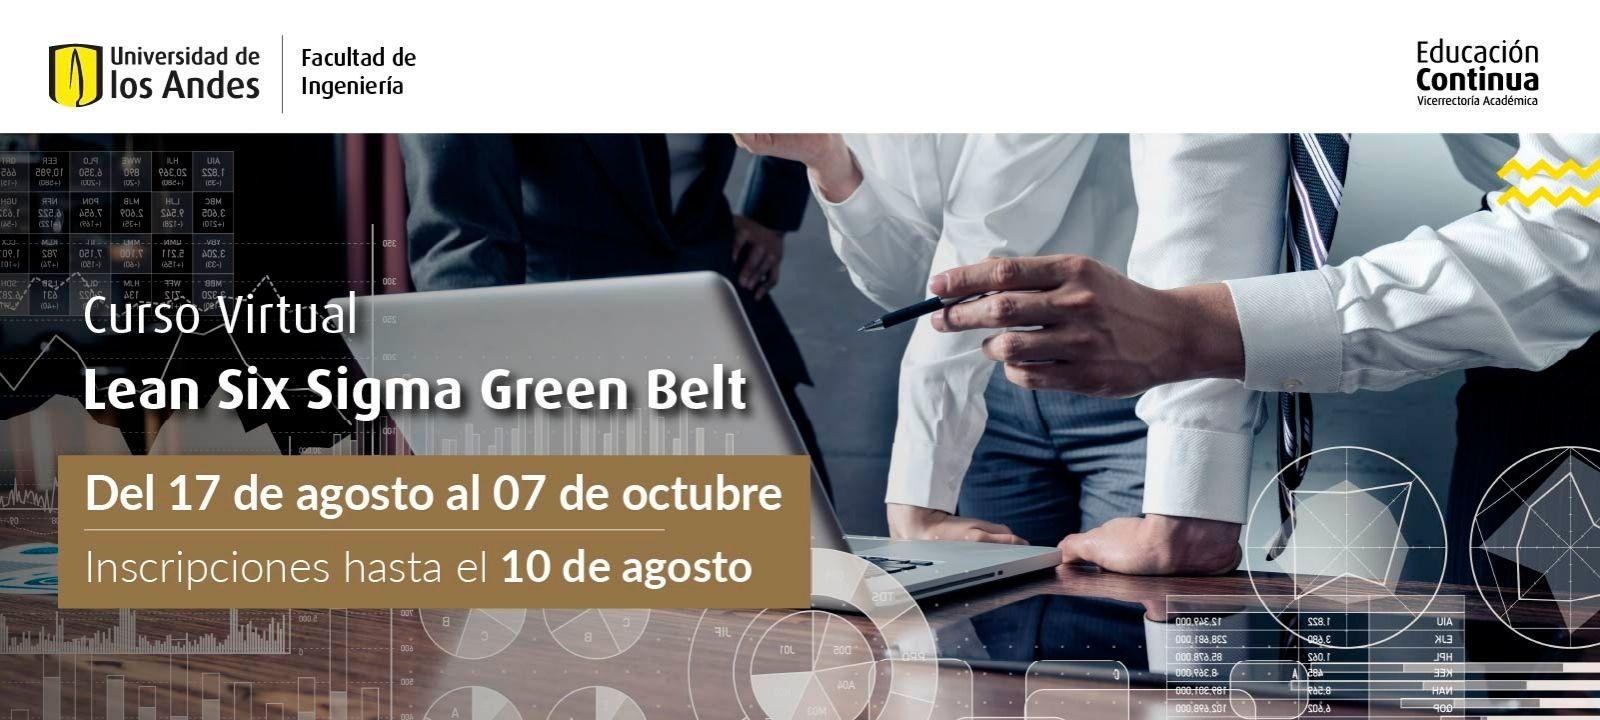 Curso virtual | Lean Six Sigma Green Belt